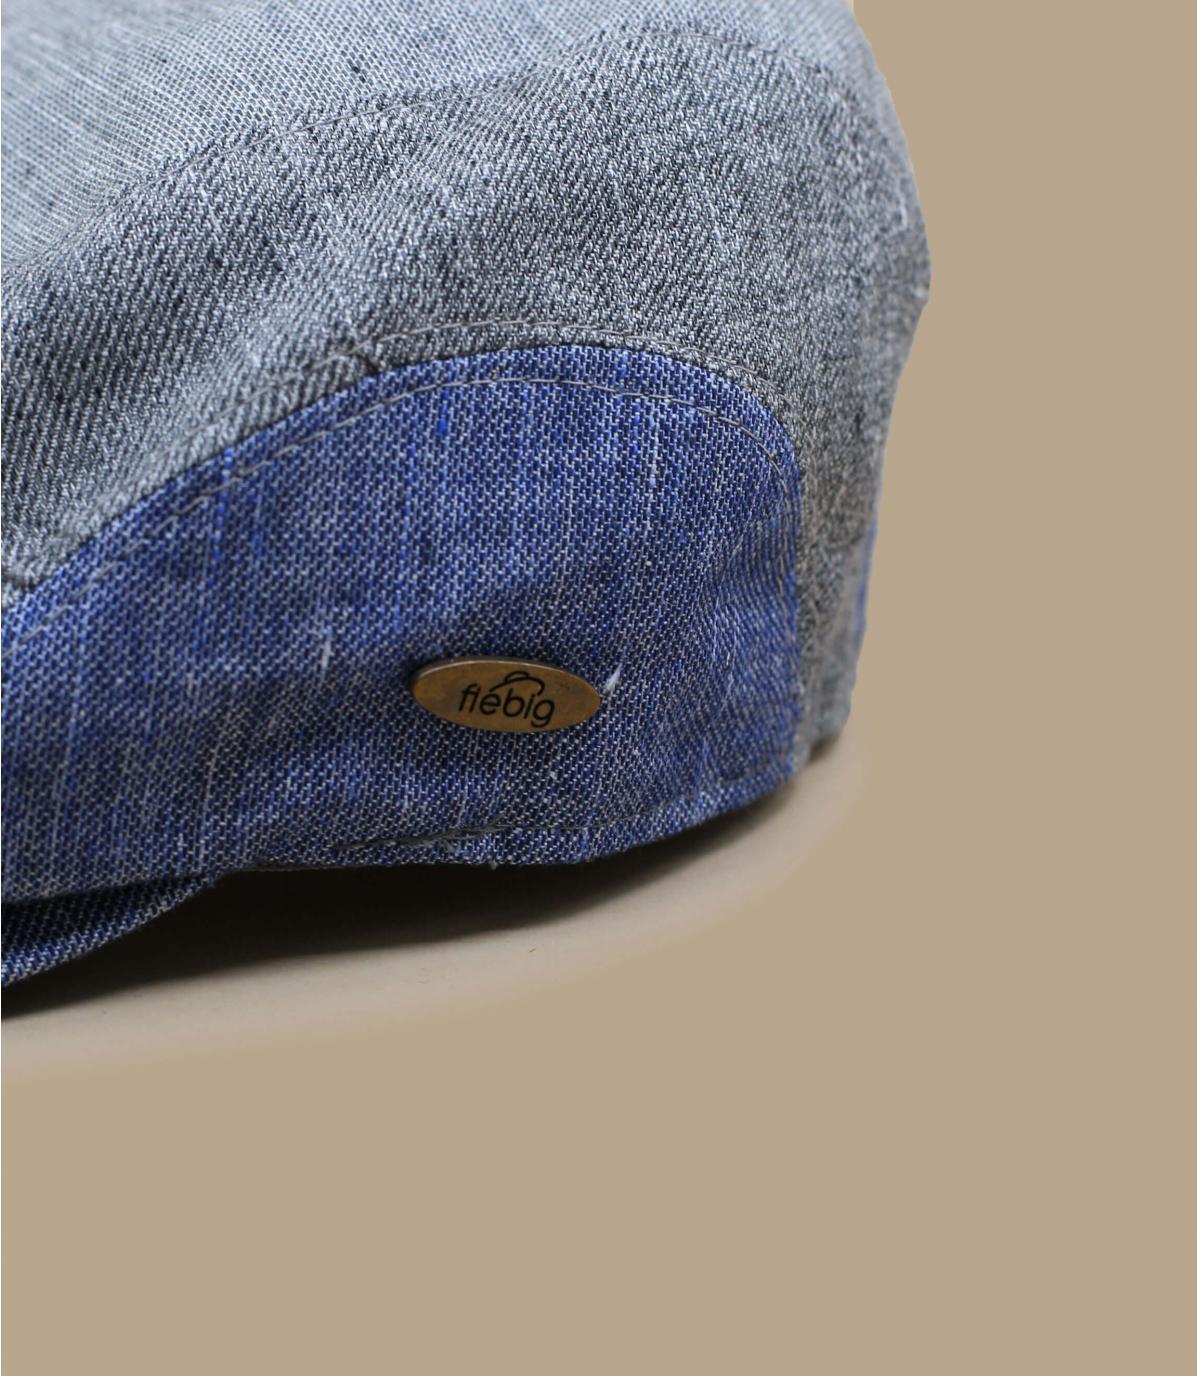 Details Chadli bleu grey - Abbildung 2